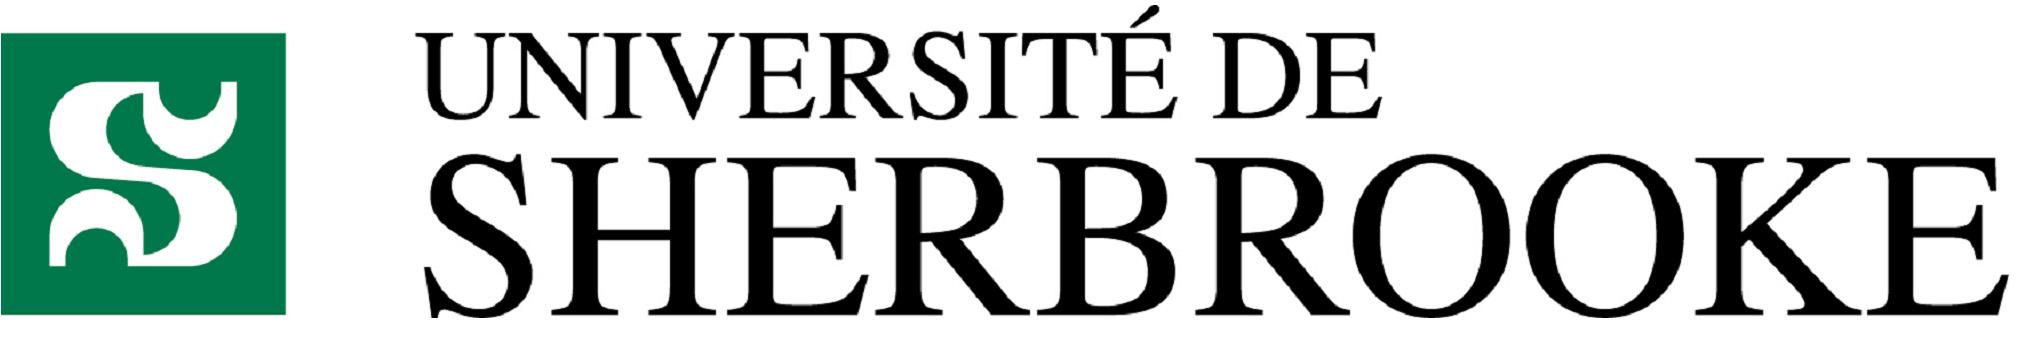 universite_sherbrooke